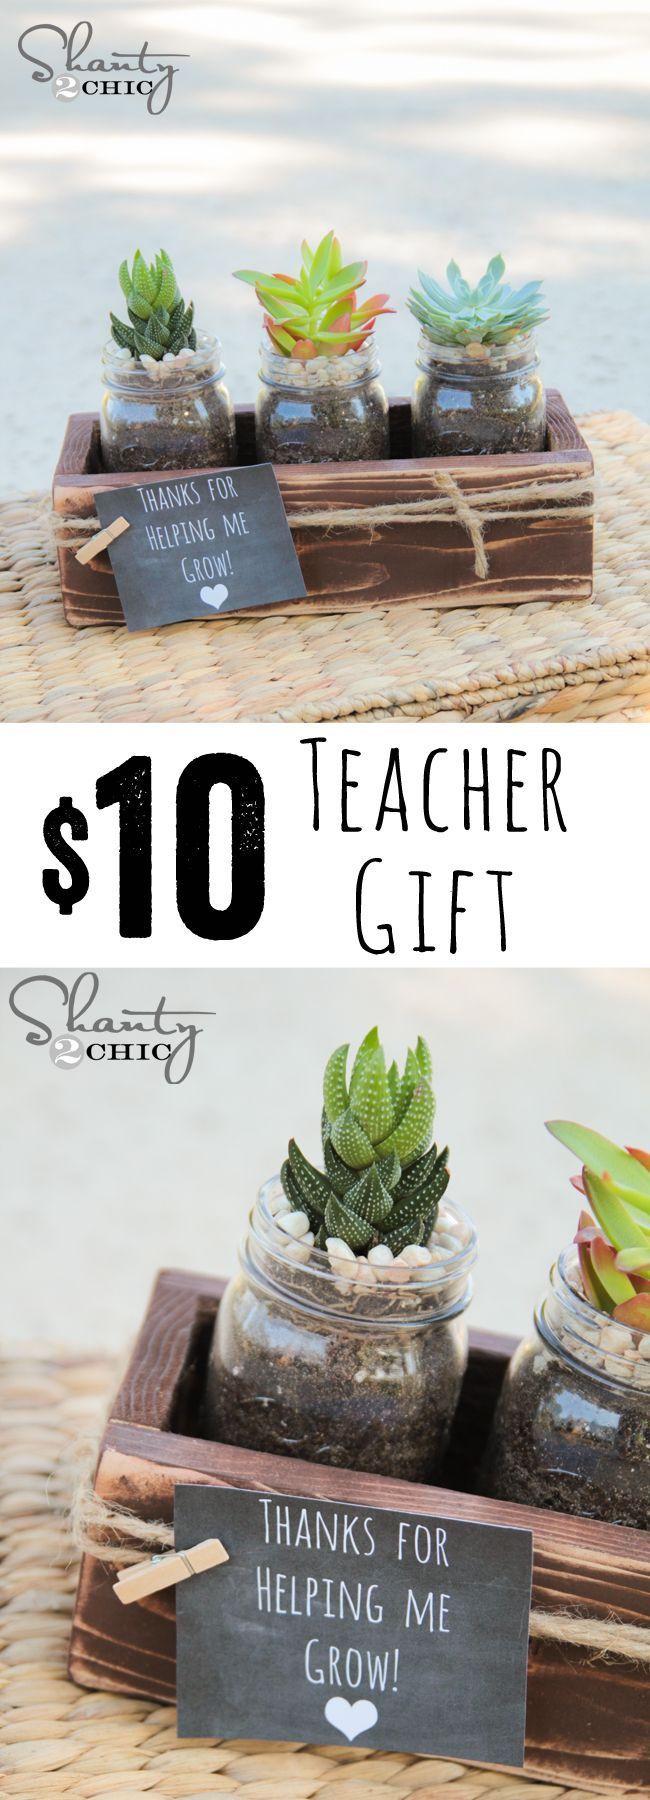 The 11 Best DIY Teacher Gifts - Helping Me Grow Gift